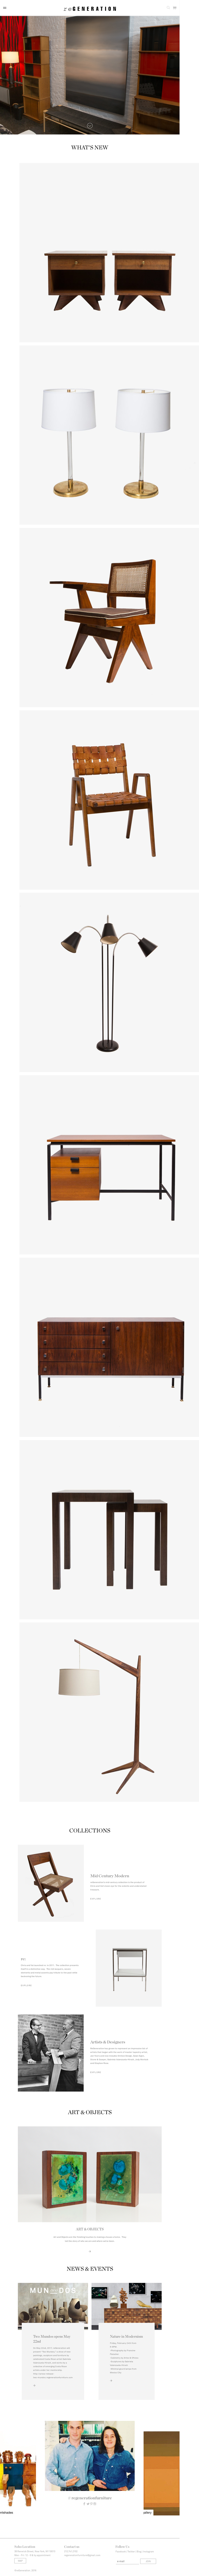 Regeneration Furniture Website History